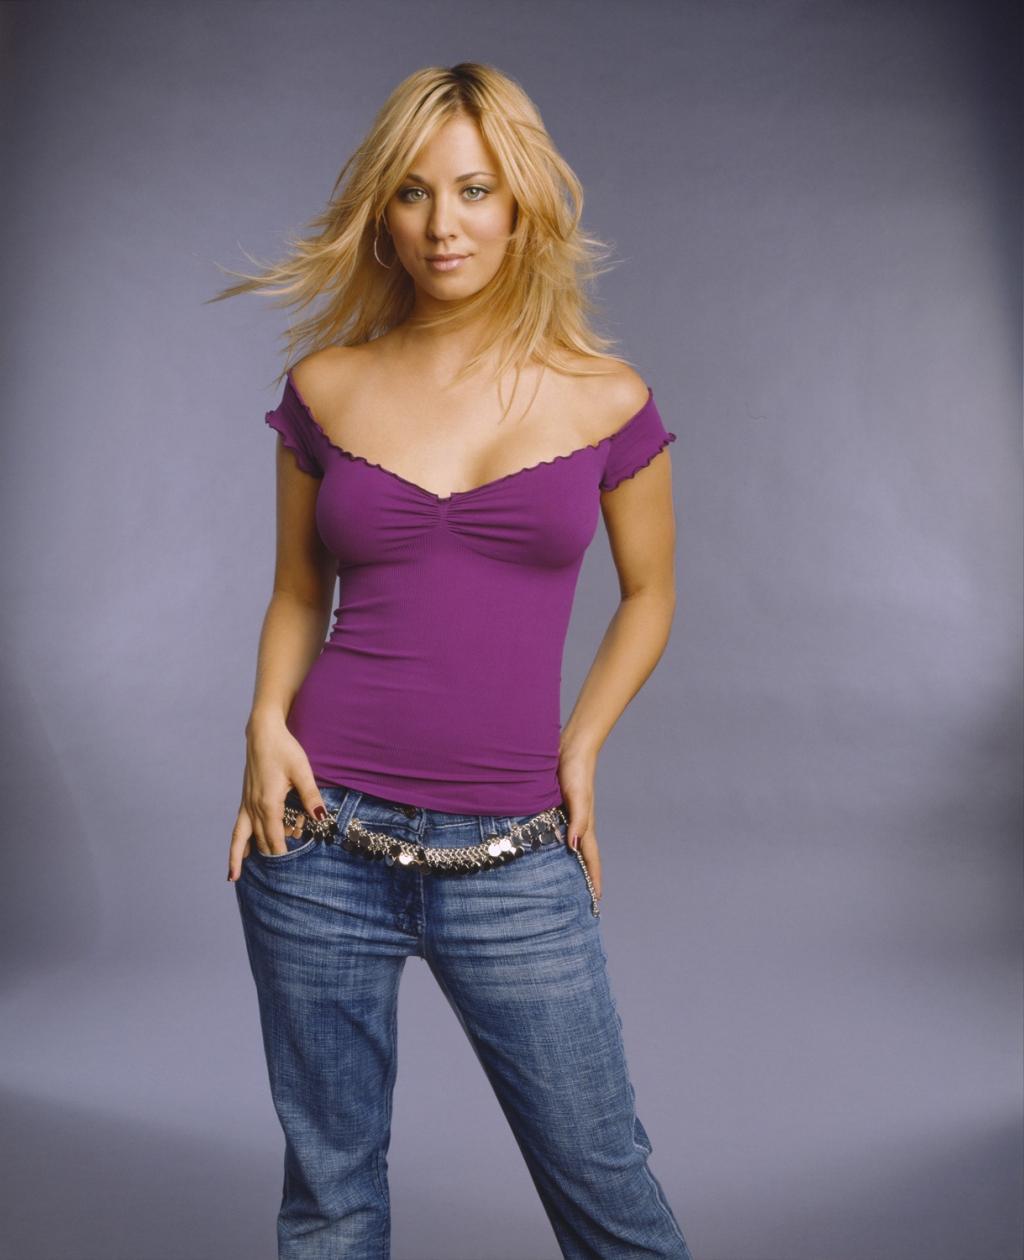 http://1.bp.blogspot.com/-k_UXCq9Qilc/UTrE19Z-fBI/AAAAAAAADc0/__0hnTwjREc/s1600/kaley-cuoco-in-off-shoulder-blouse-with-sequin-belted-jeans-person-photo-u1.jpg